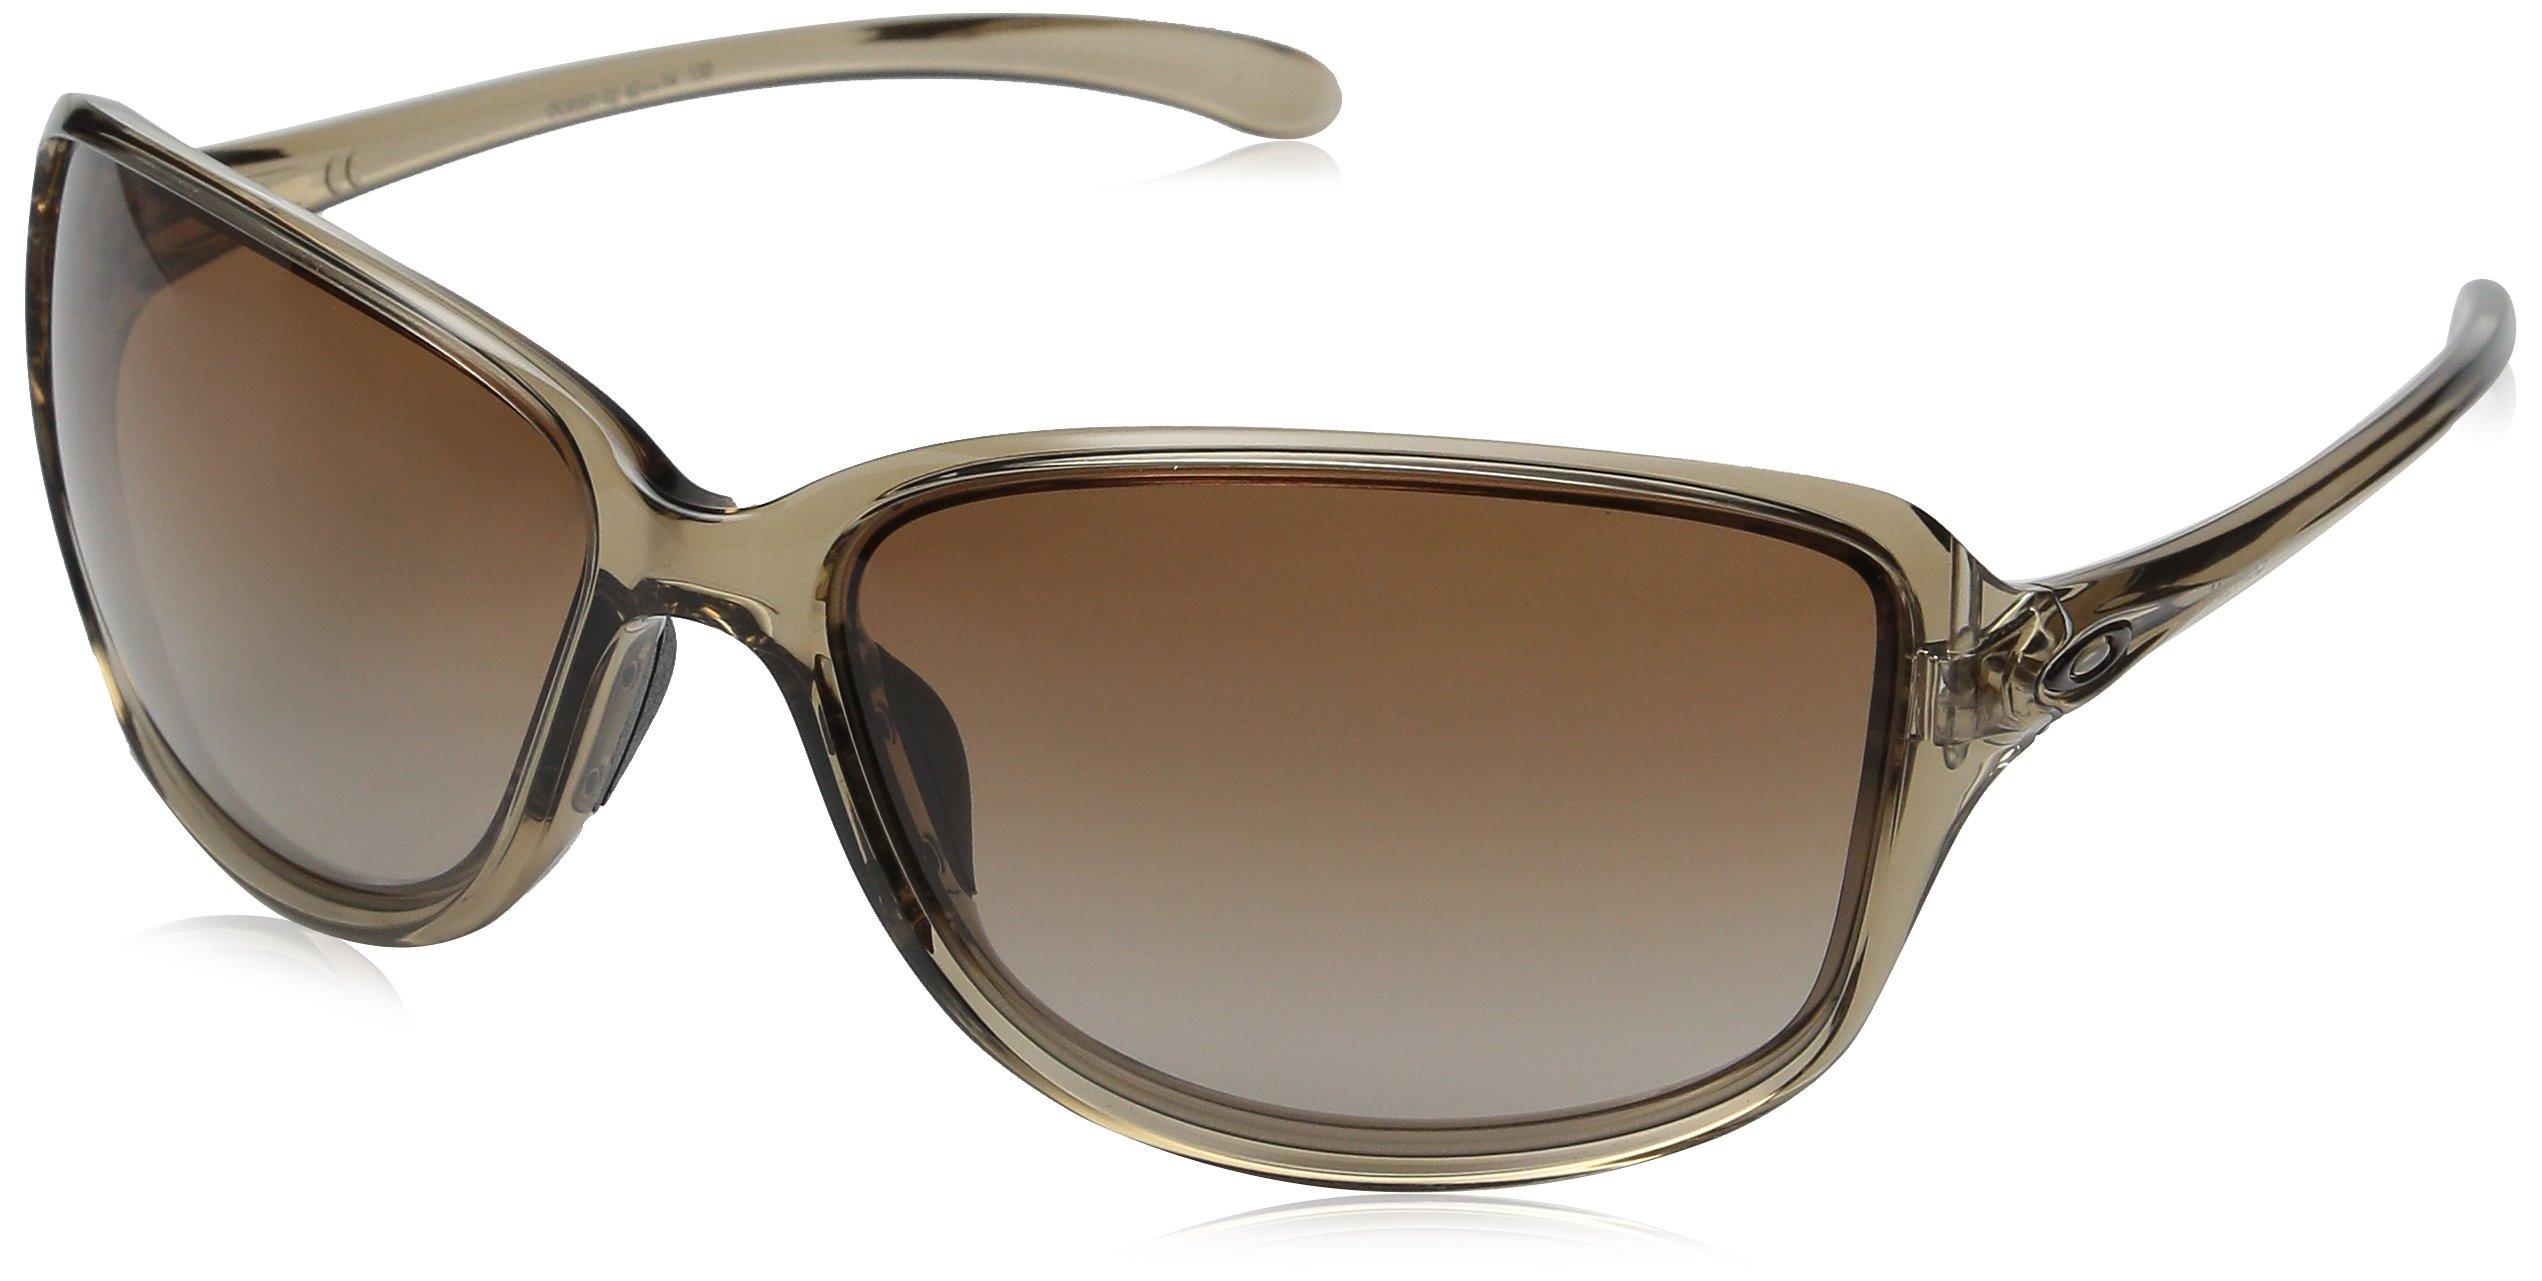 Oakley Women's Cohort Rectangular Sunglasses SEPIA 62.0 mm